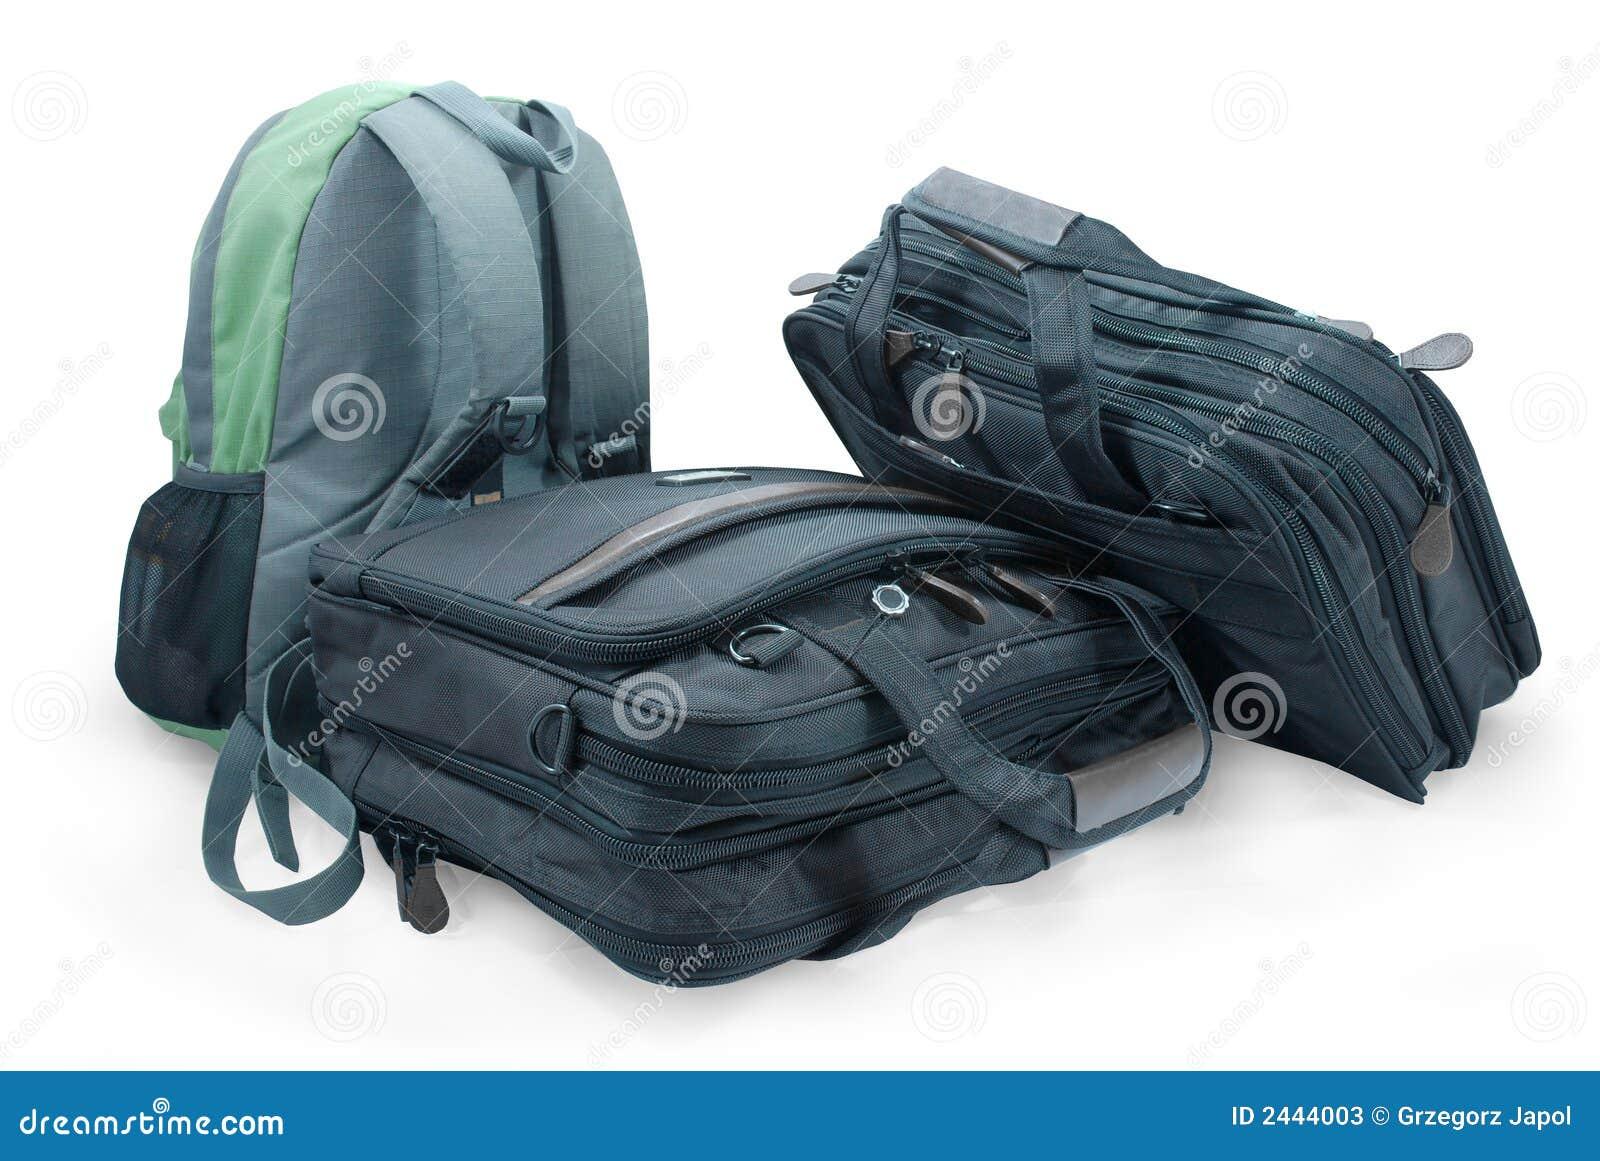 0e39b1cc3c Backpack βαλίτσες αποσκευών Στοκ Εικόνα - εικόνα από εξάρτηση ...